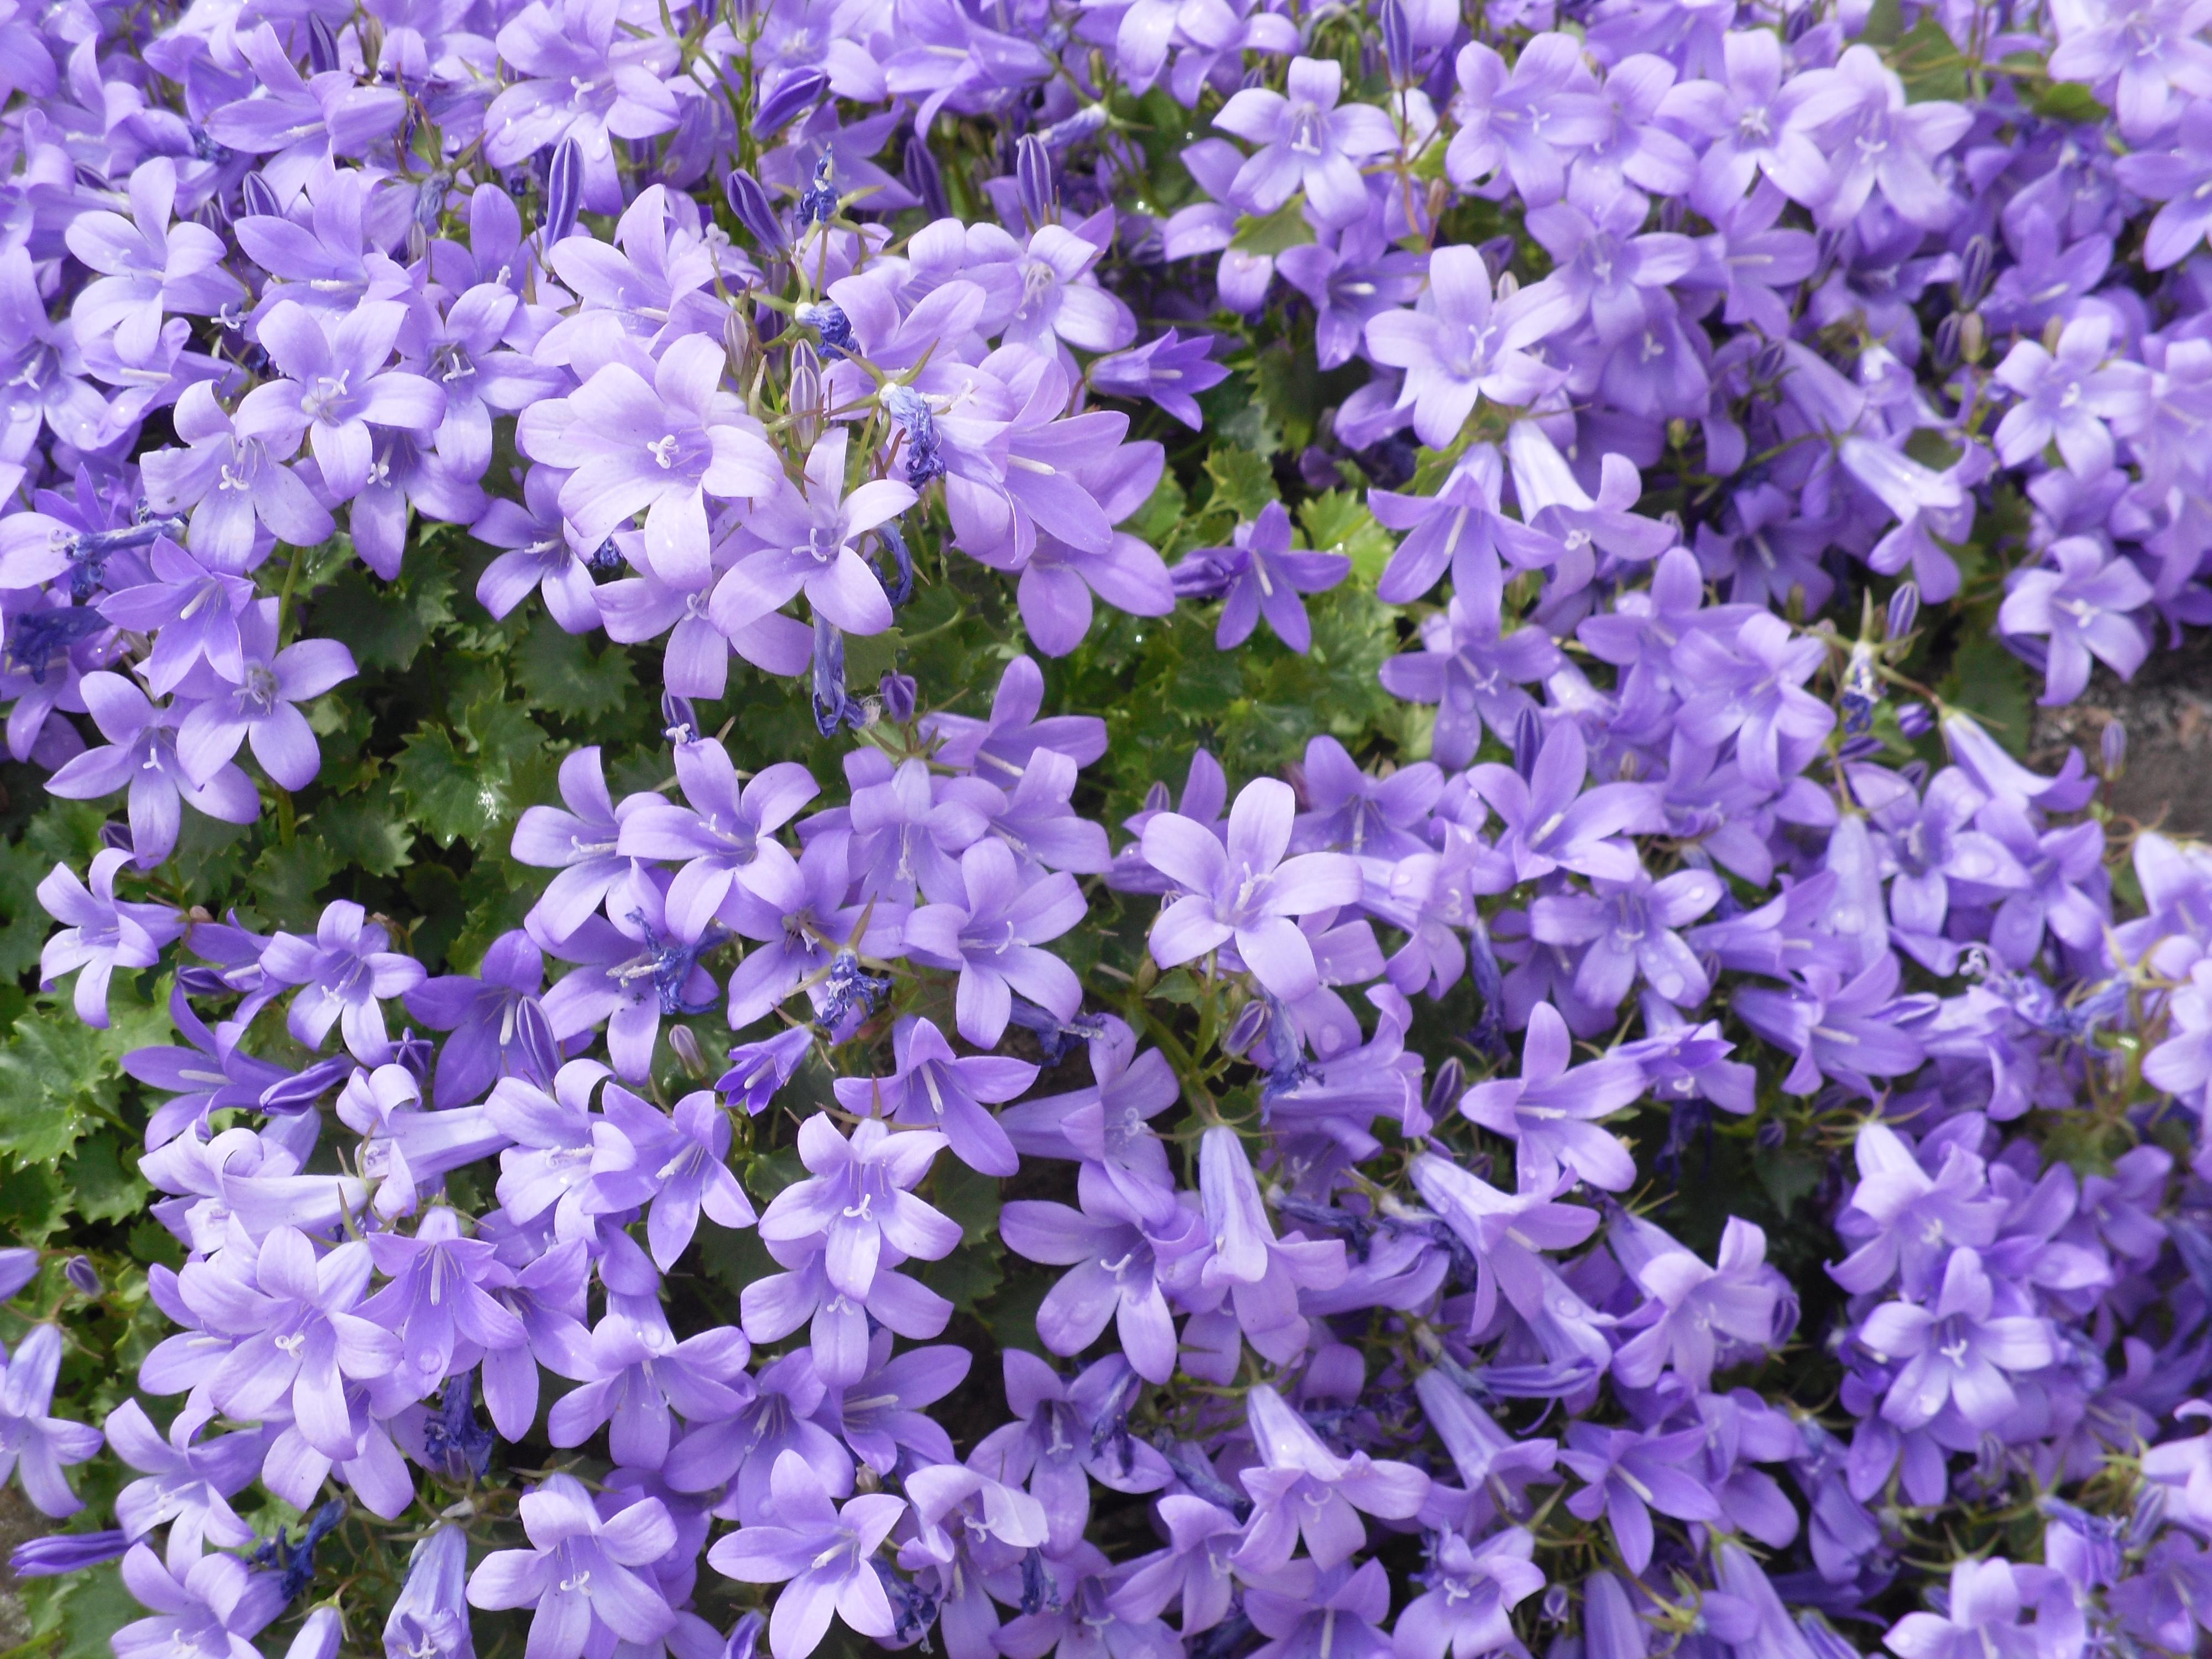 flowers zikkin.com